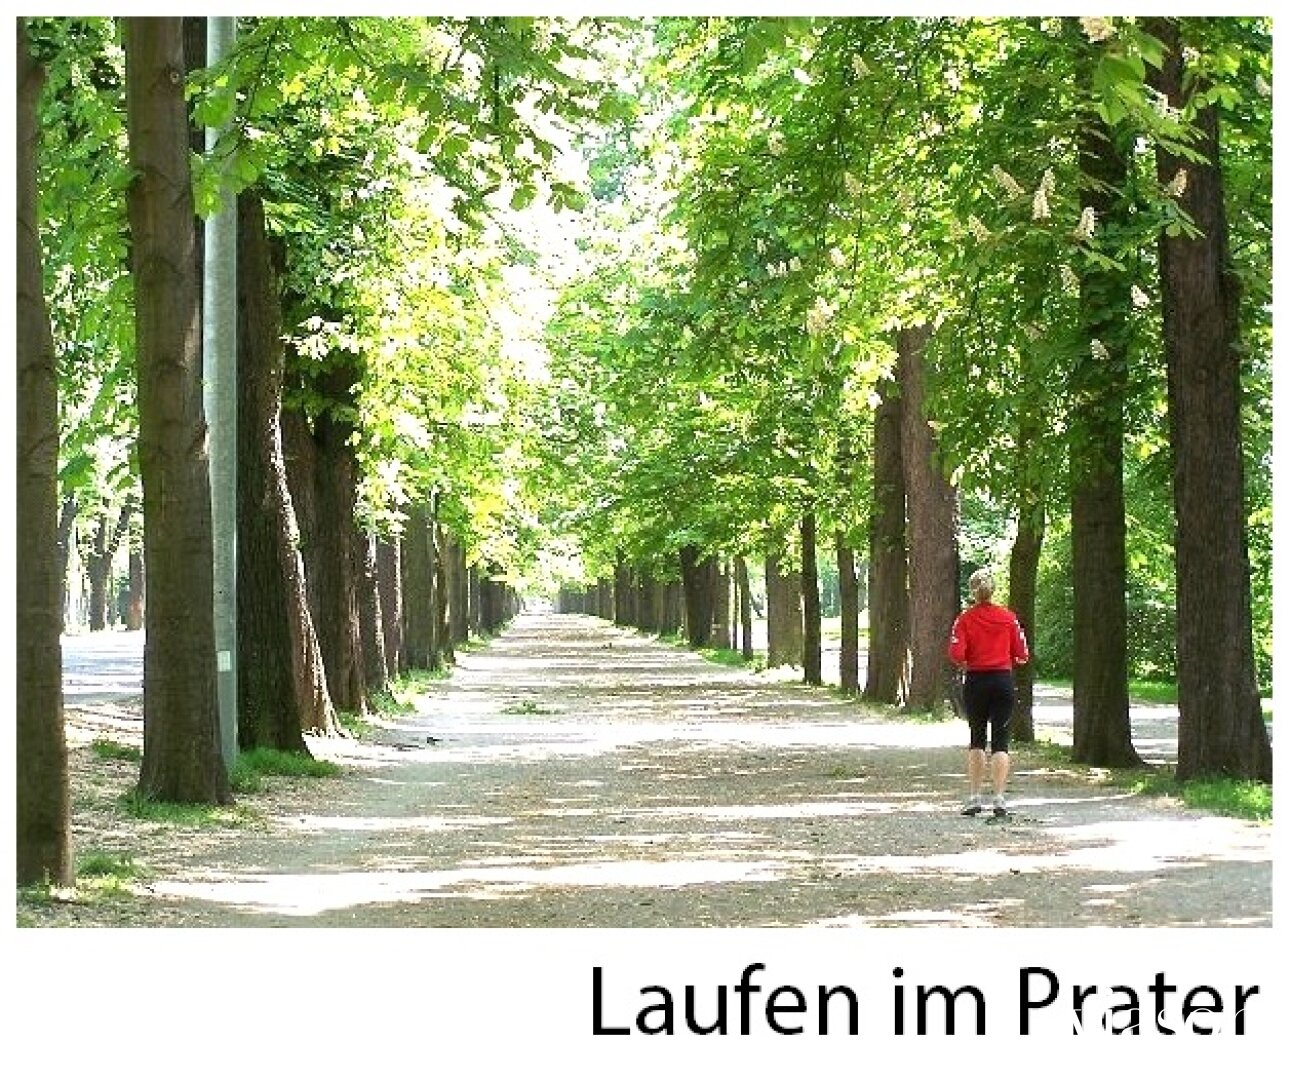 Laufen im Prater